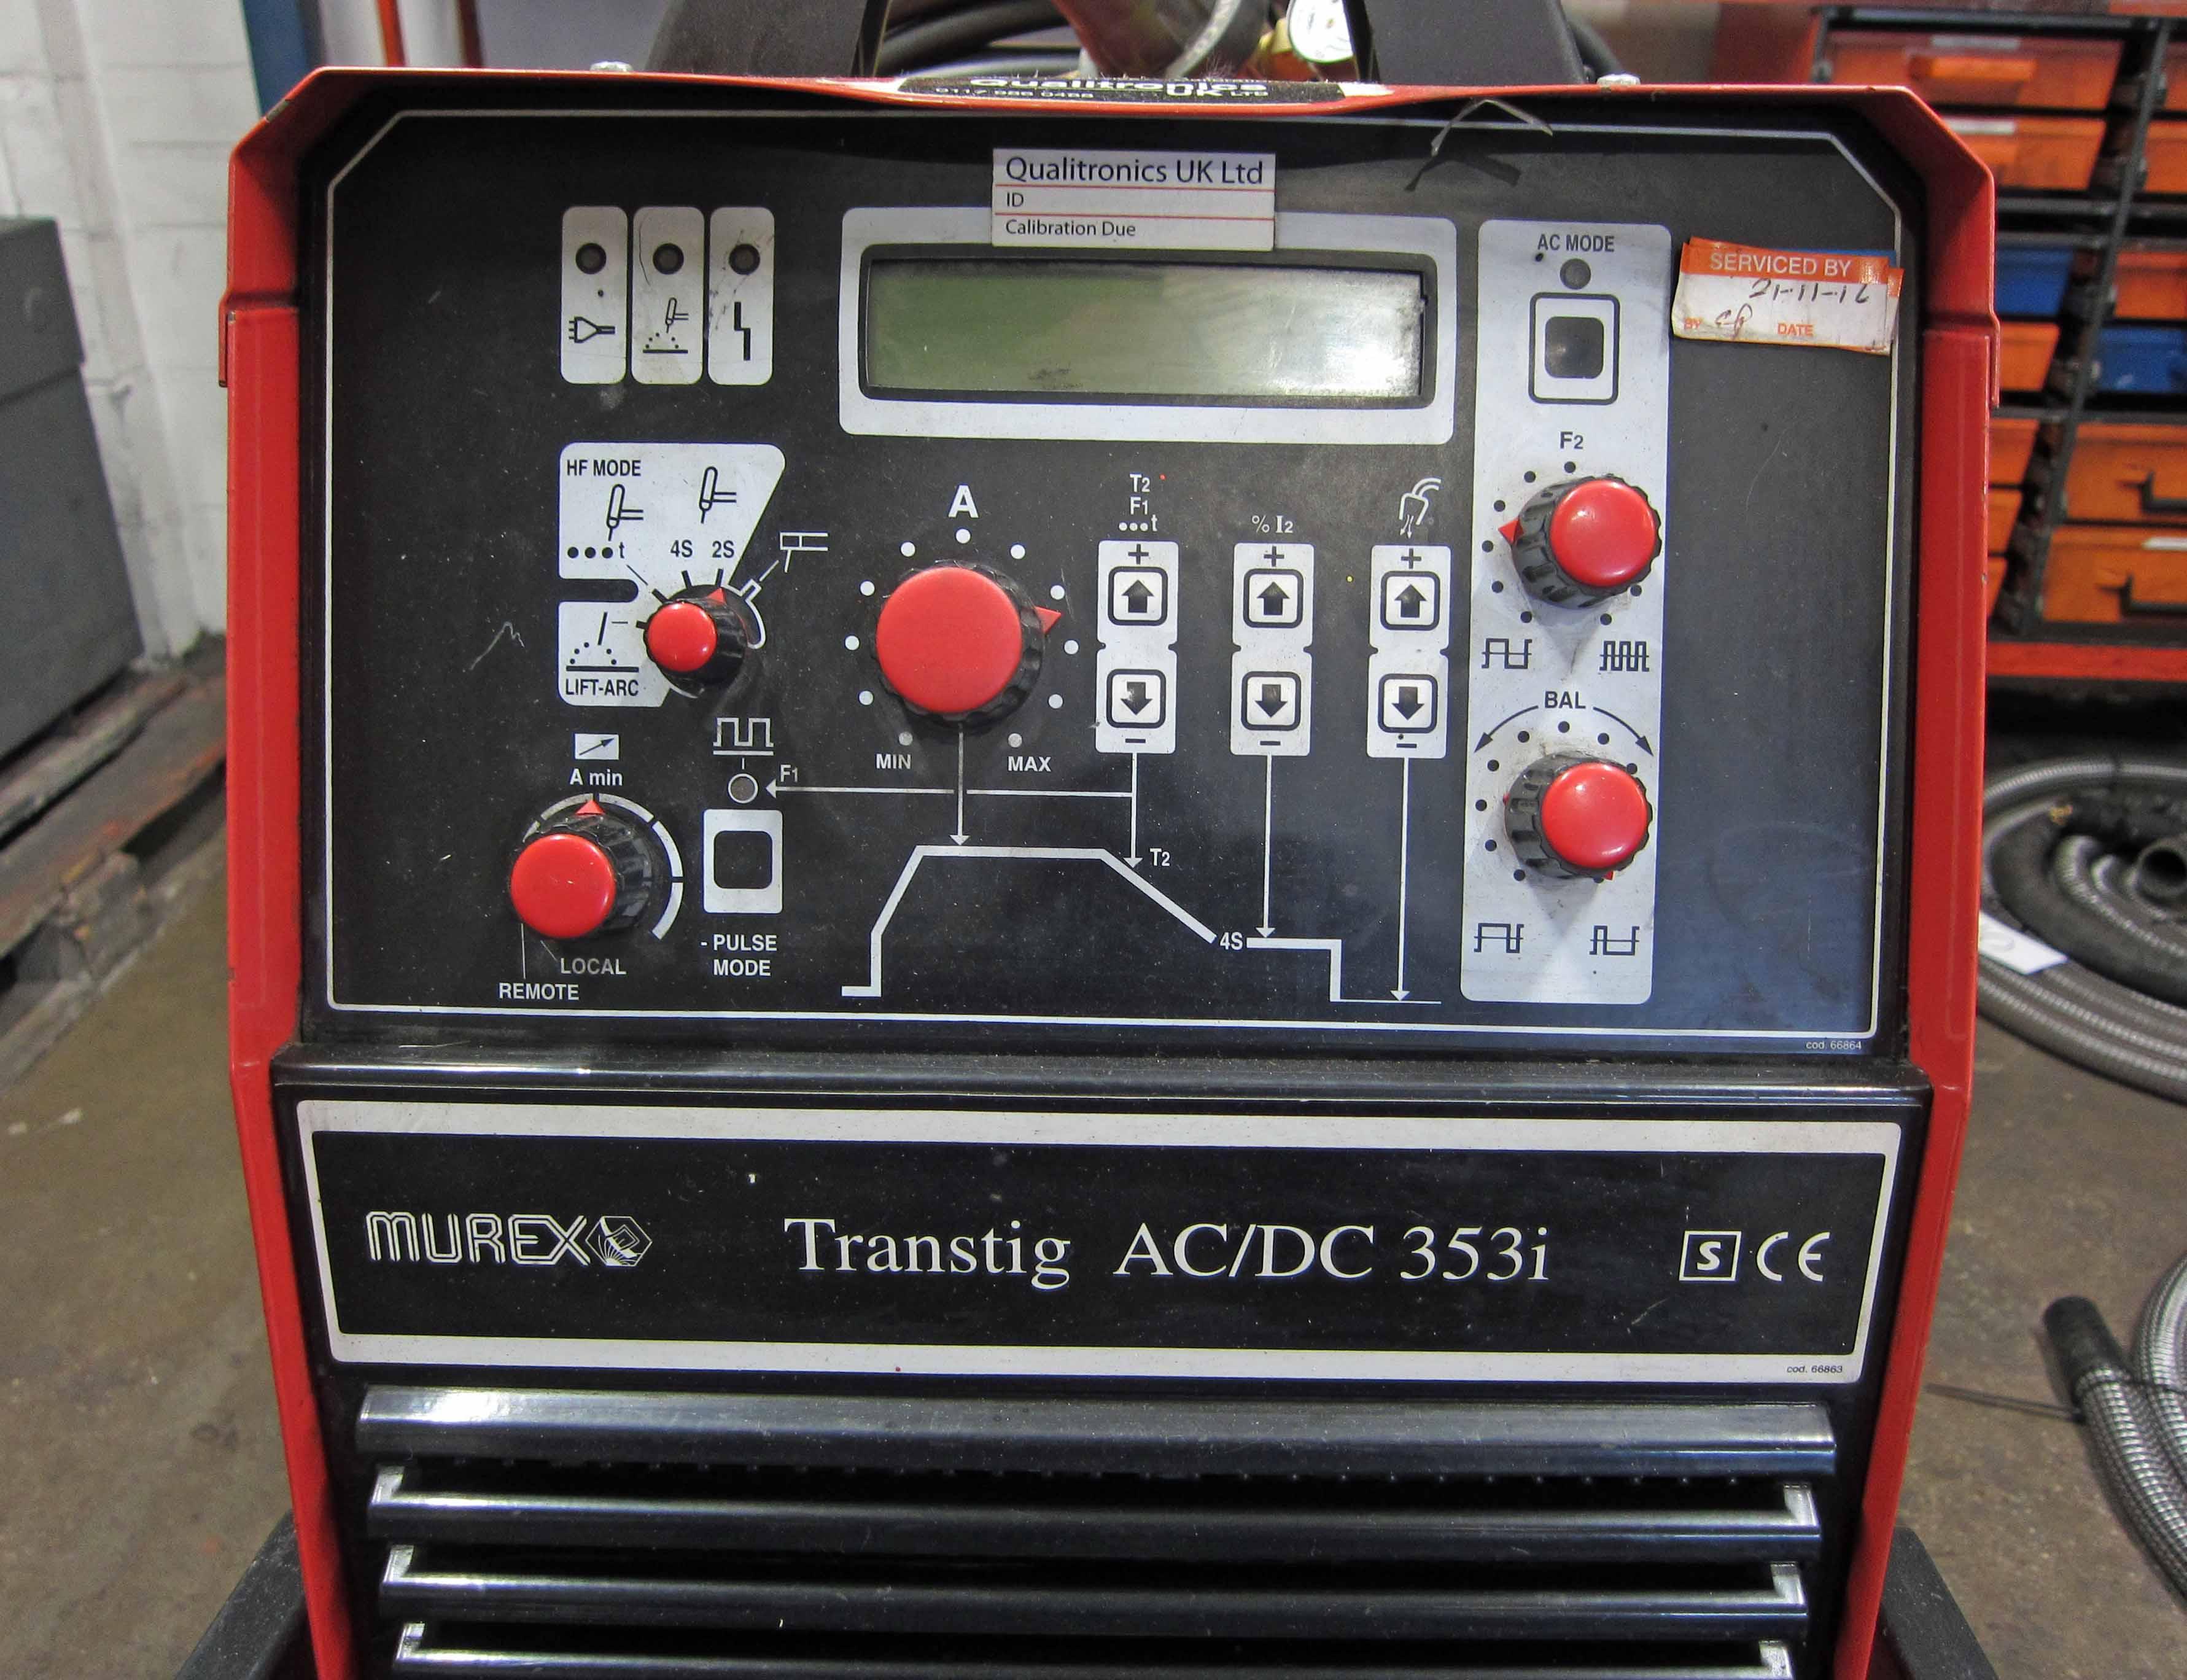 A MUREX Model Transtig AC/DC 353i Tig Welder, Serial No. 0602243, complete with MUREX Model TWCU, - Image 5 of 9